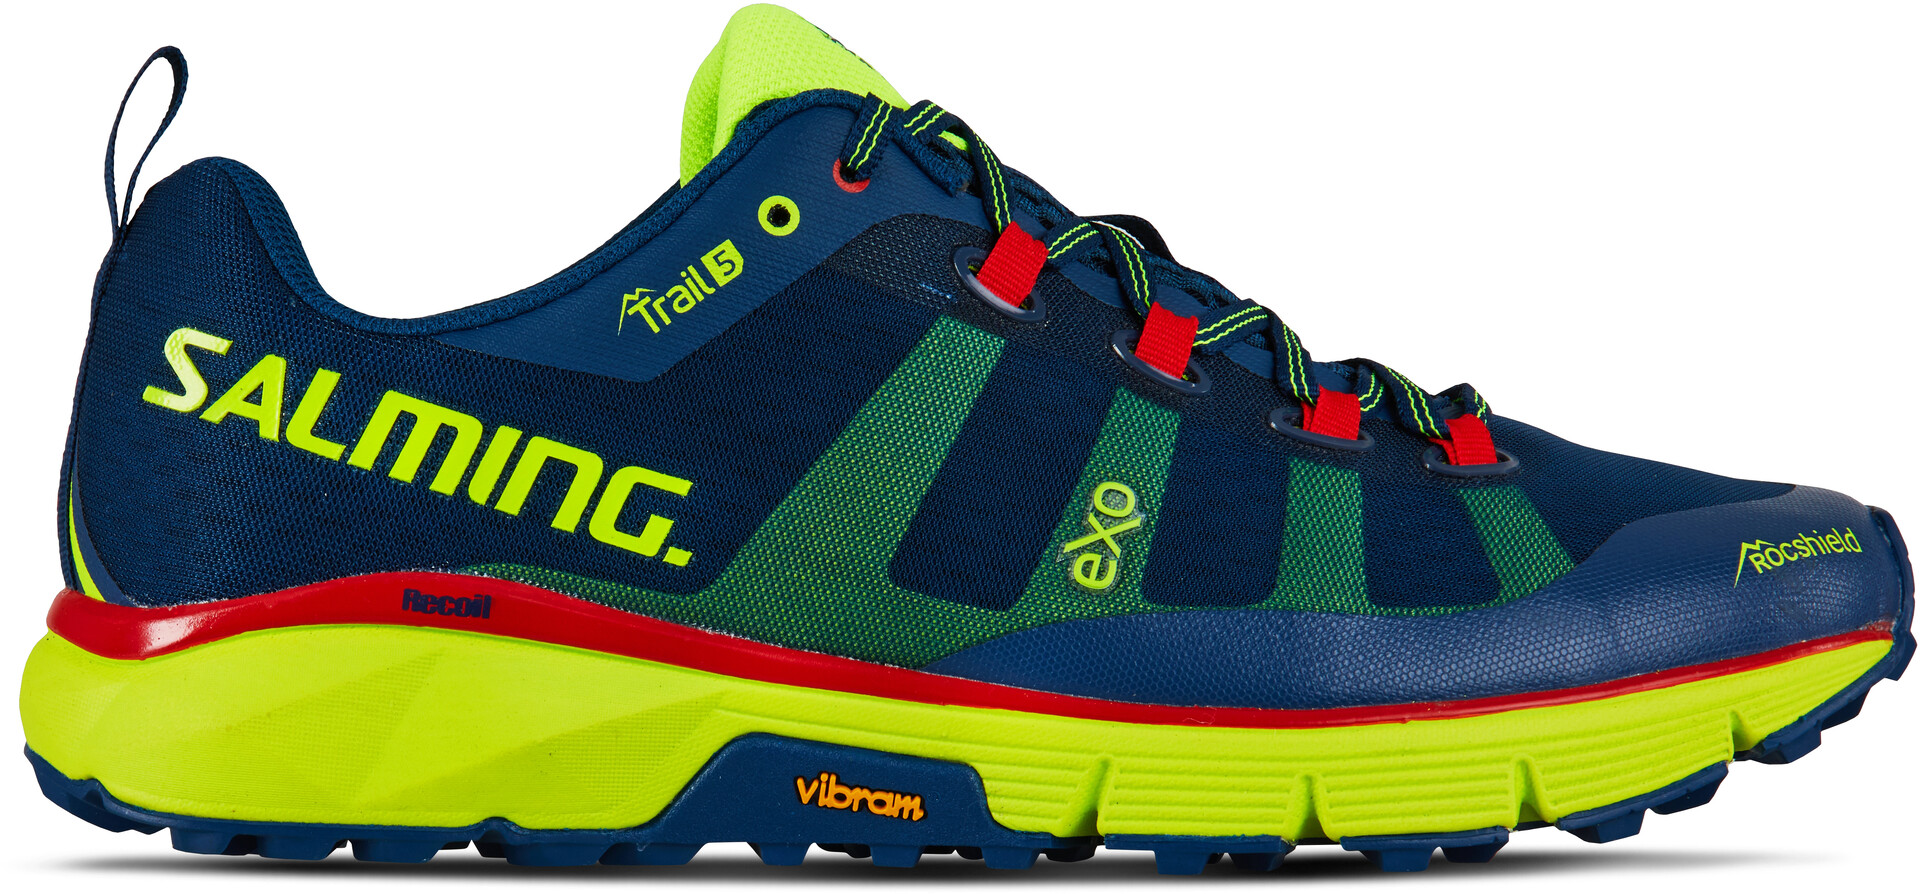 Salming Trail 5 Shoes Men poseidon blue